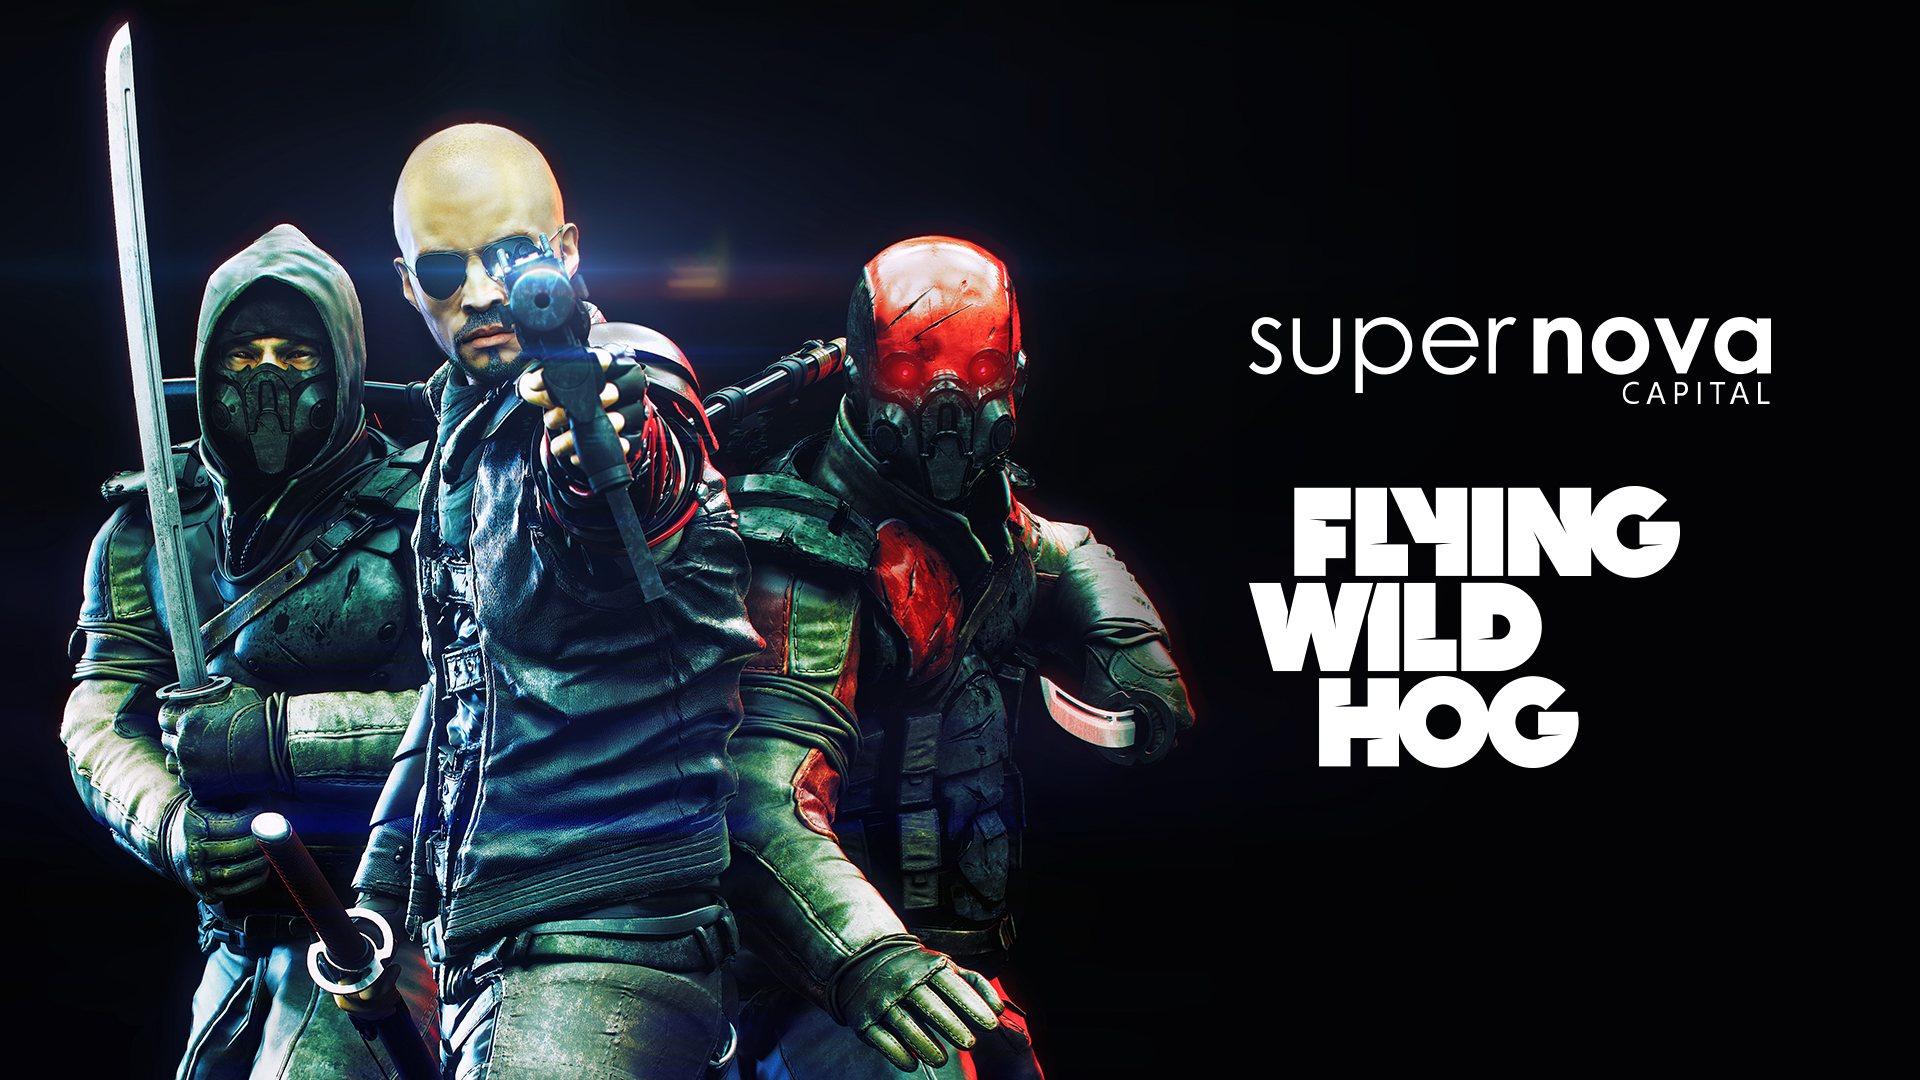 Supernova Capital & Flying Wild Hog logos side-by-side